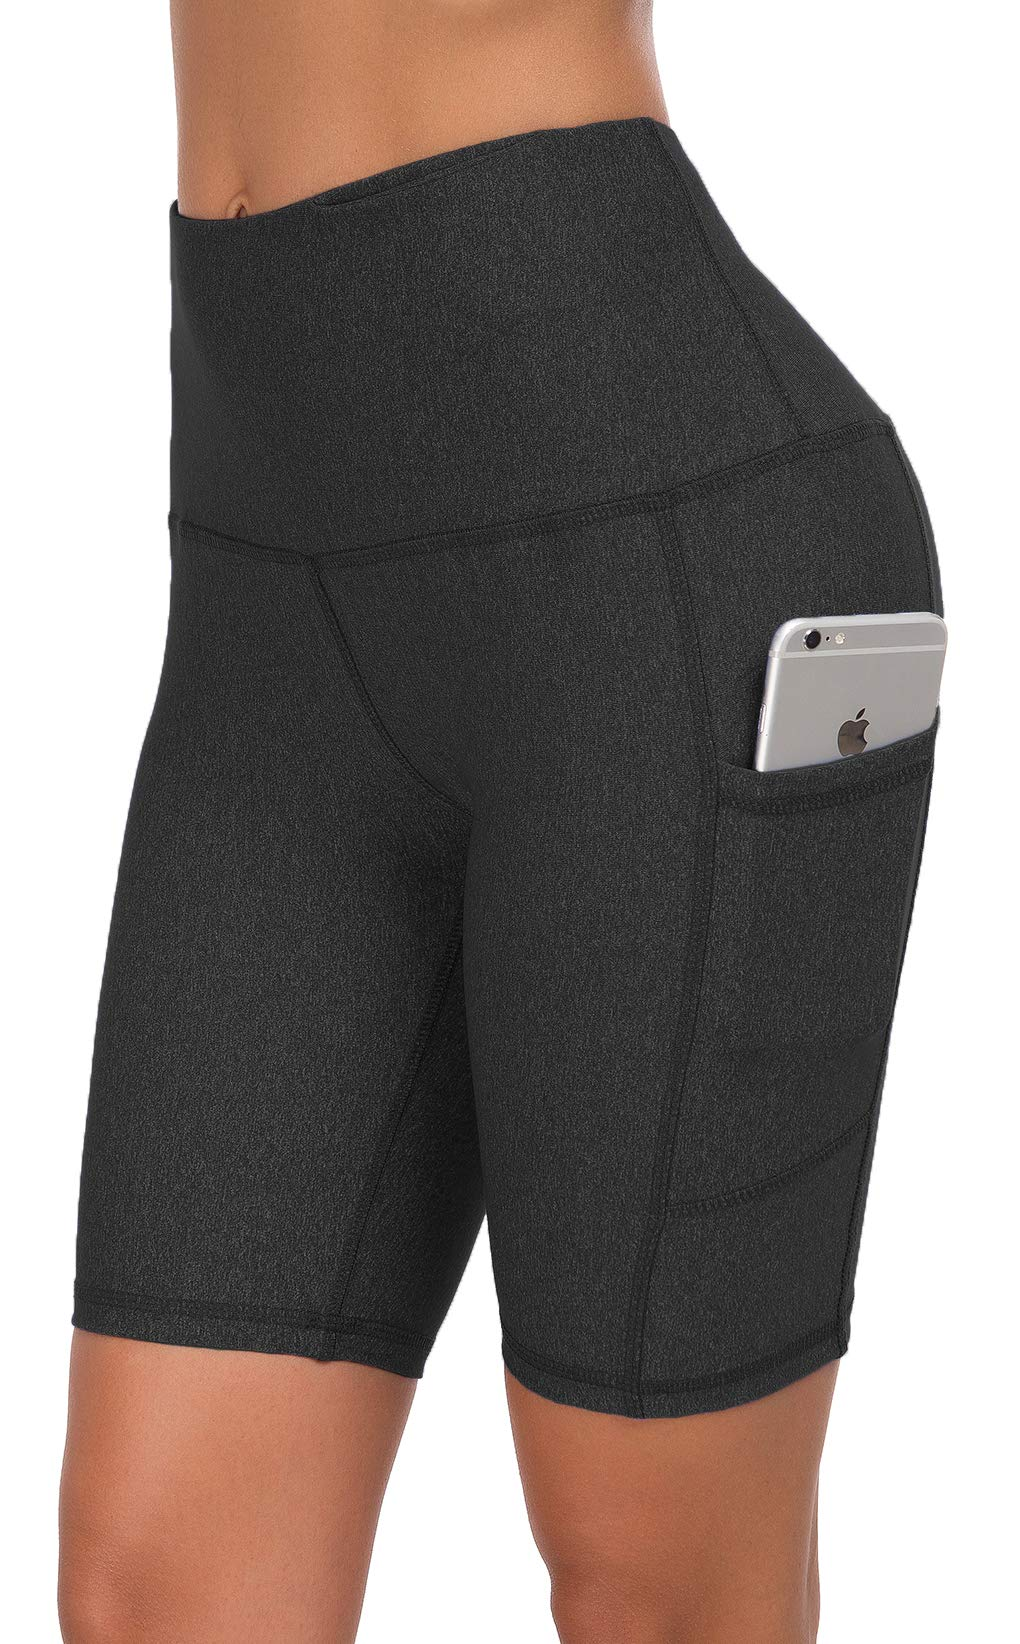 Custer's Night Premium Thick High Waist Tummy Compression Slimming Leggings Black Snow Dot S